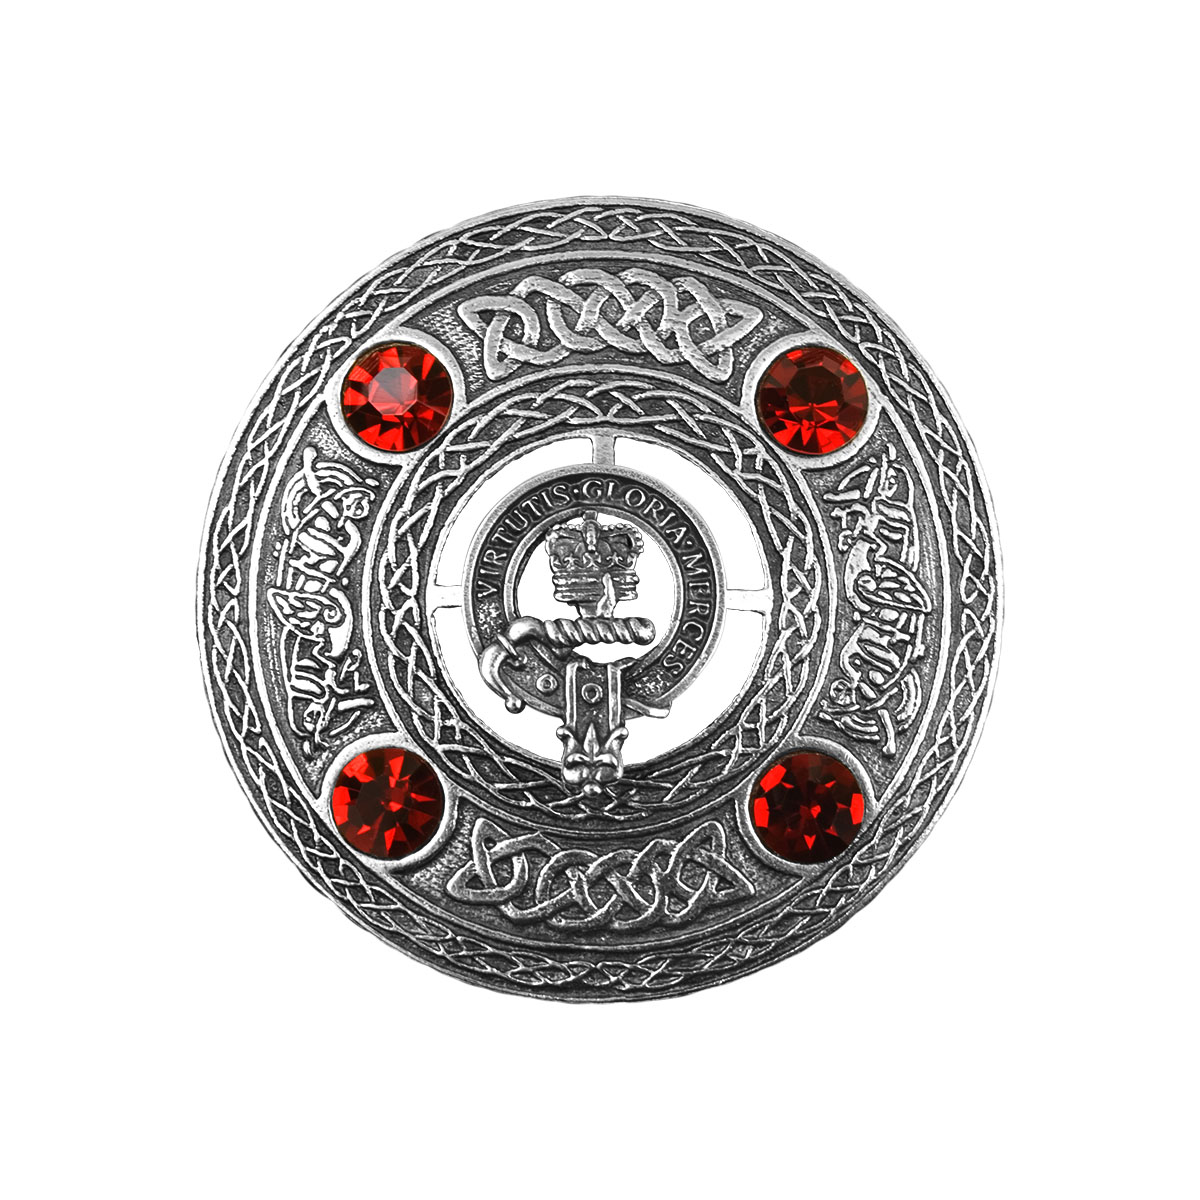 Mercer Clan Badge Scottish Plaid Brooch